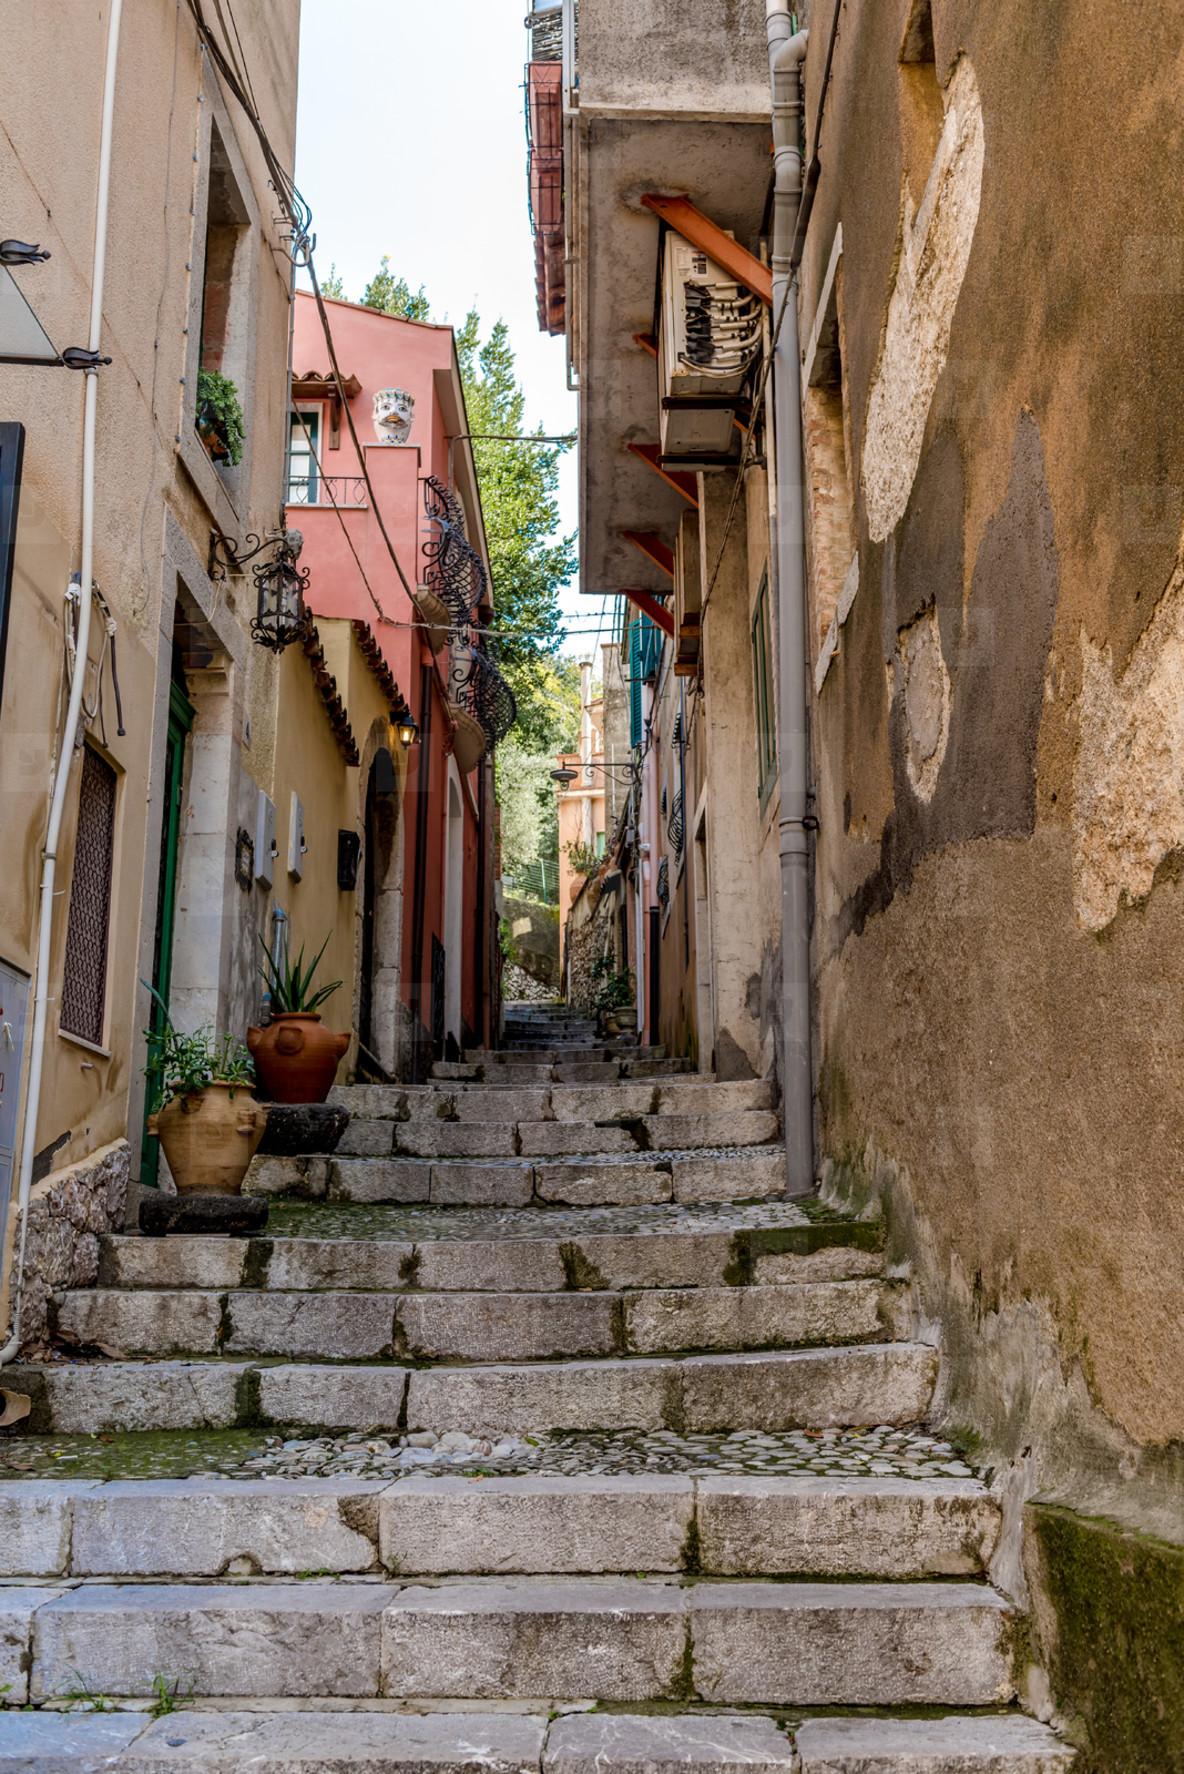 Streets of sycily